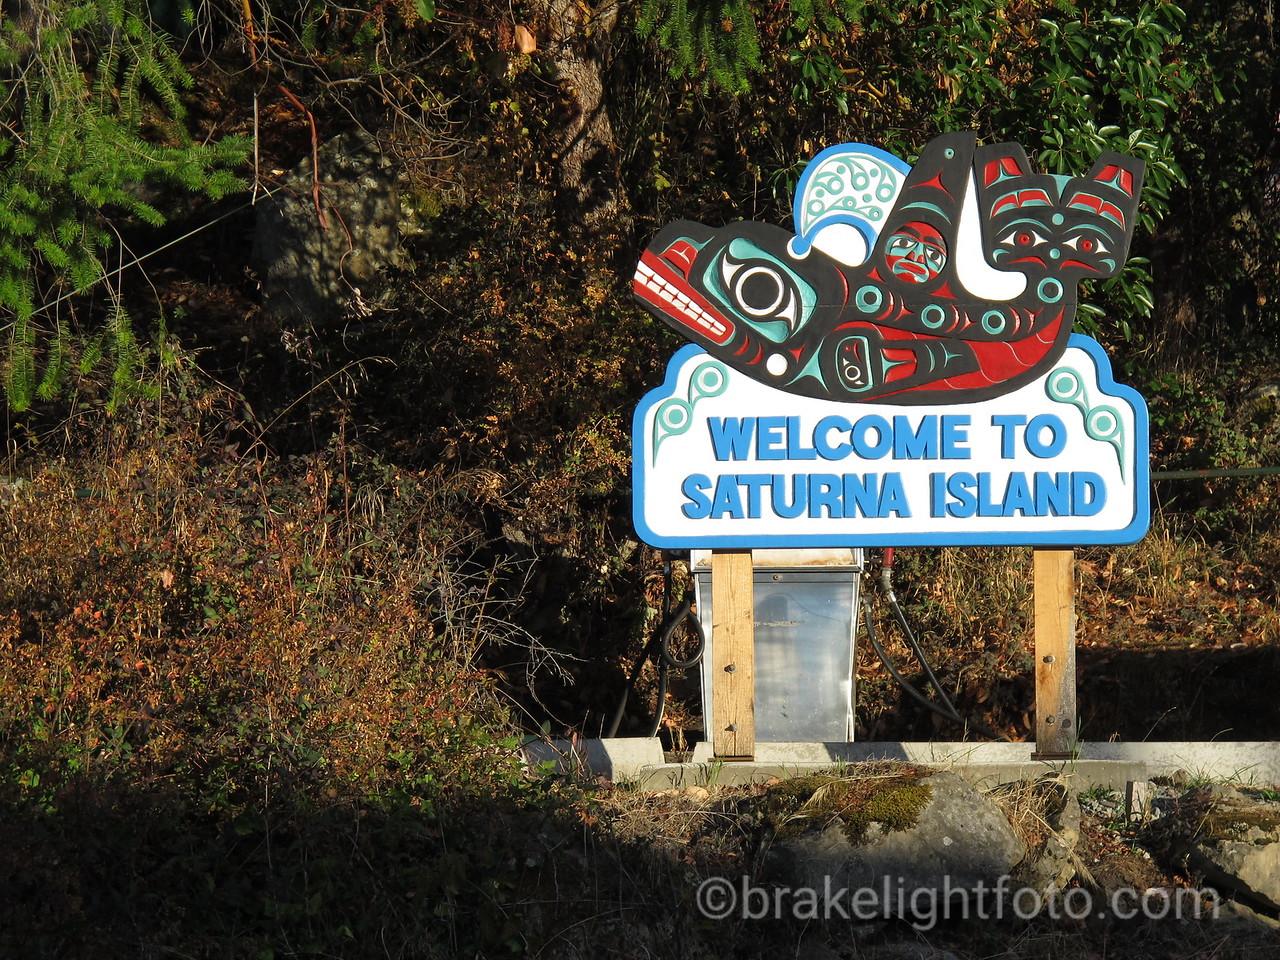 Saturna Island Welcome Sign